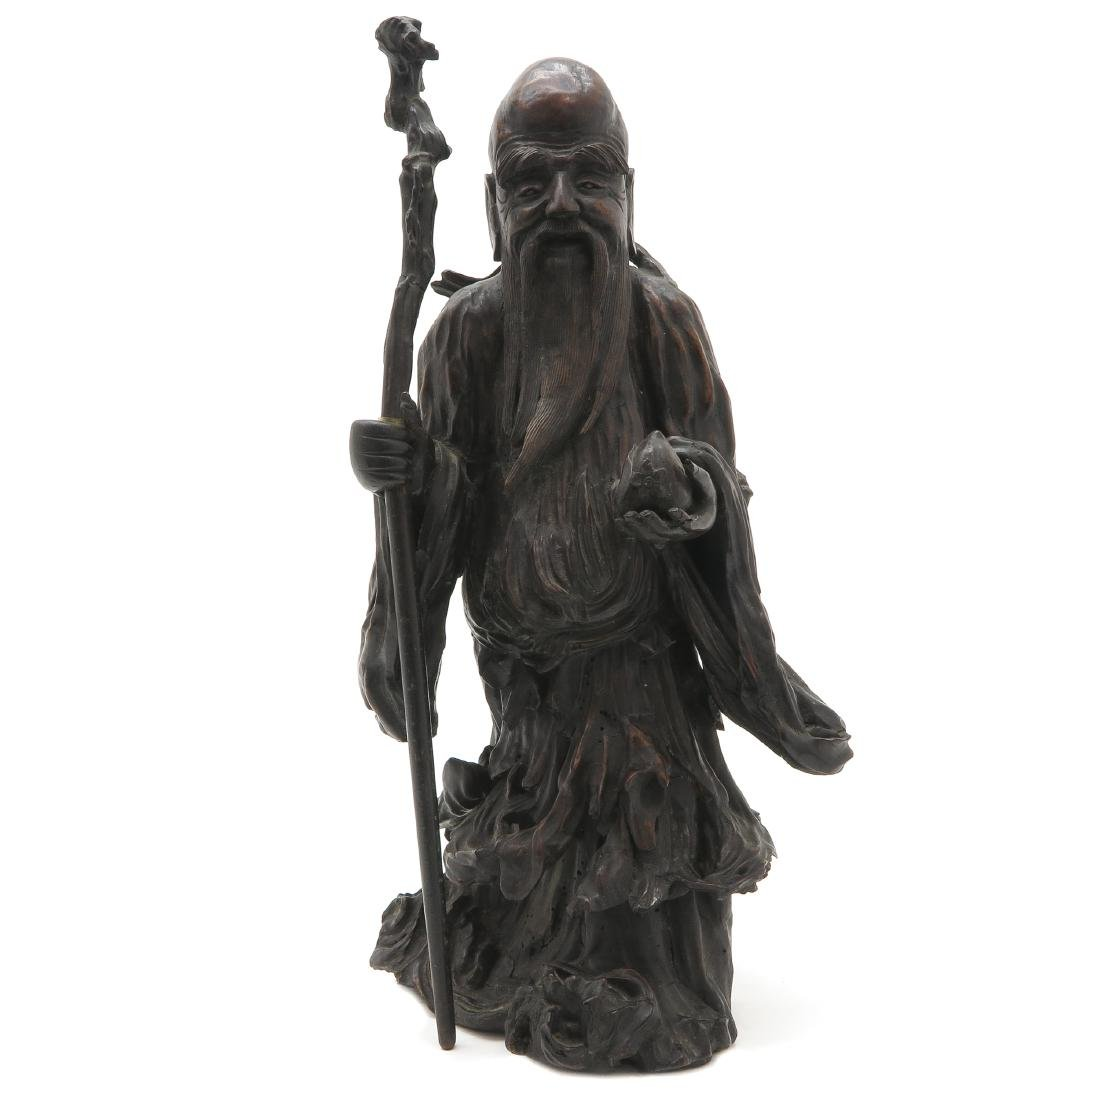 Carved Wood Chinese God of Longevity